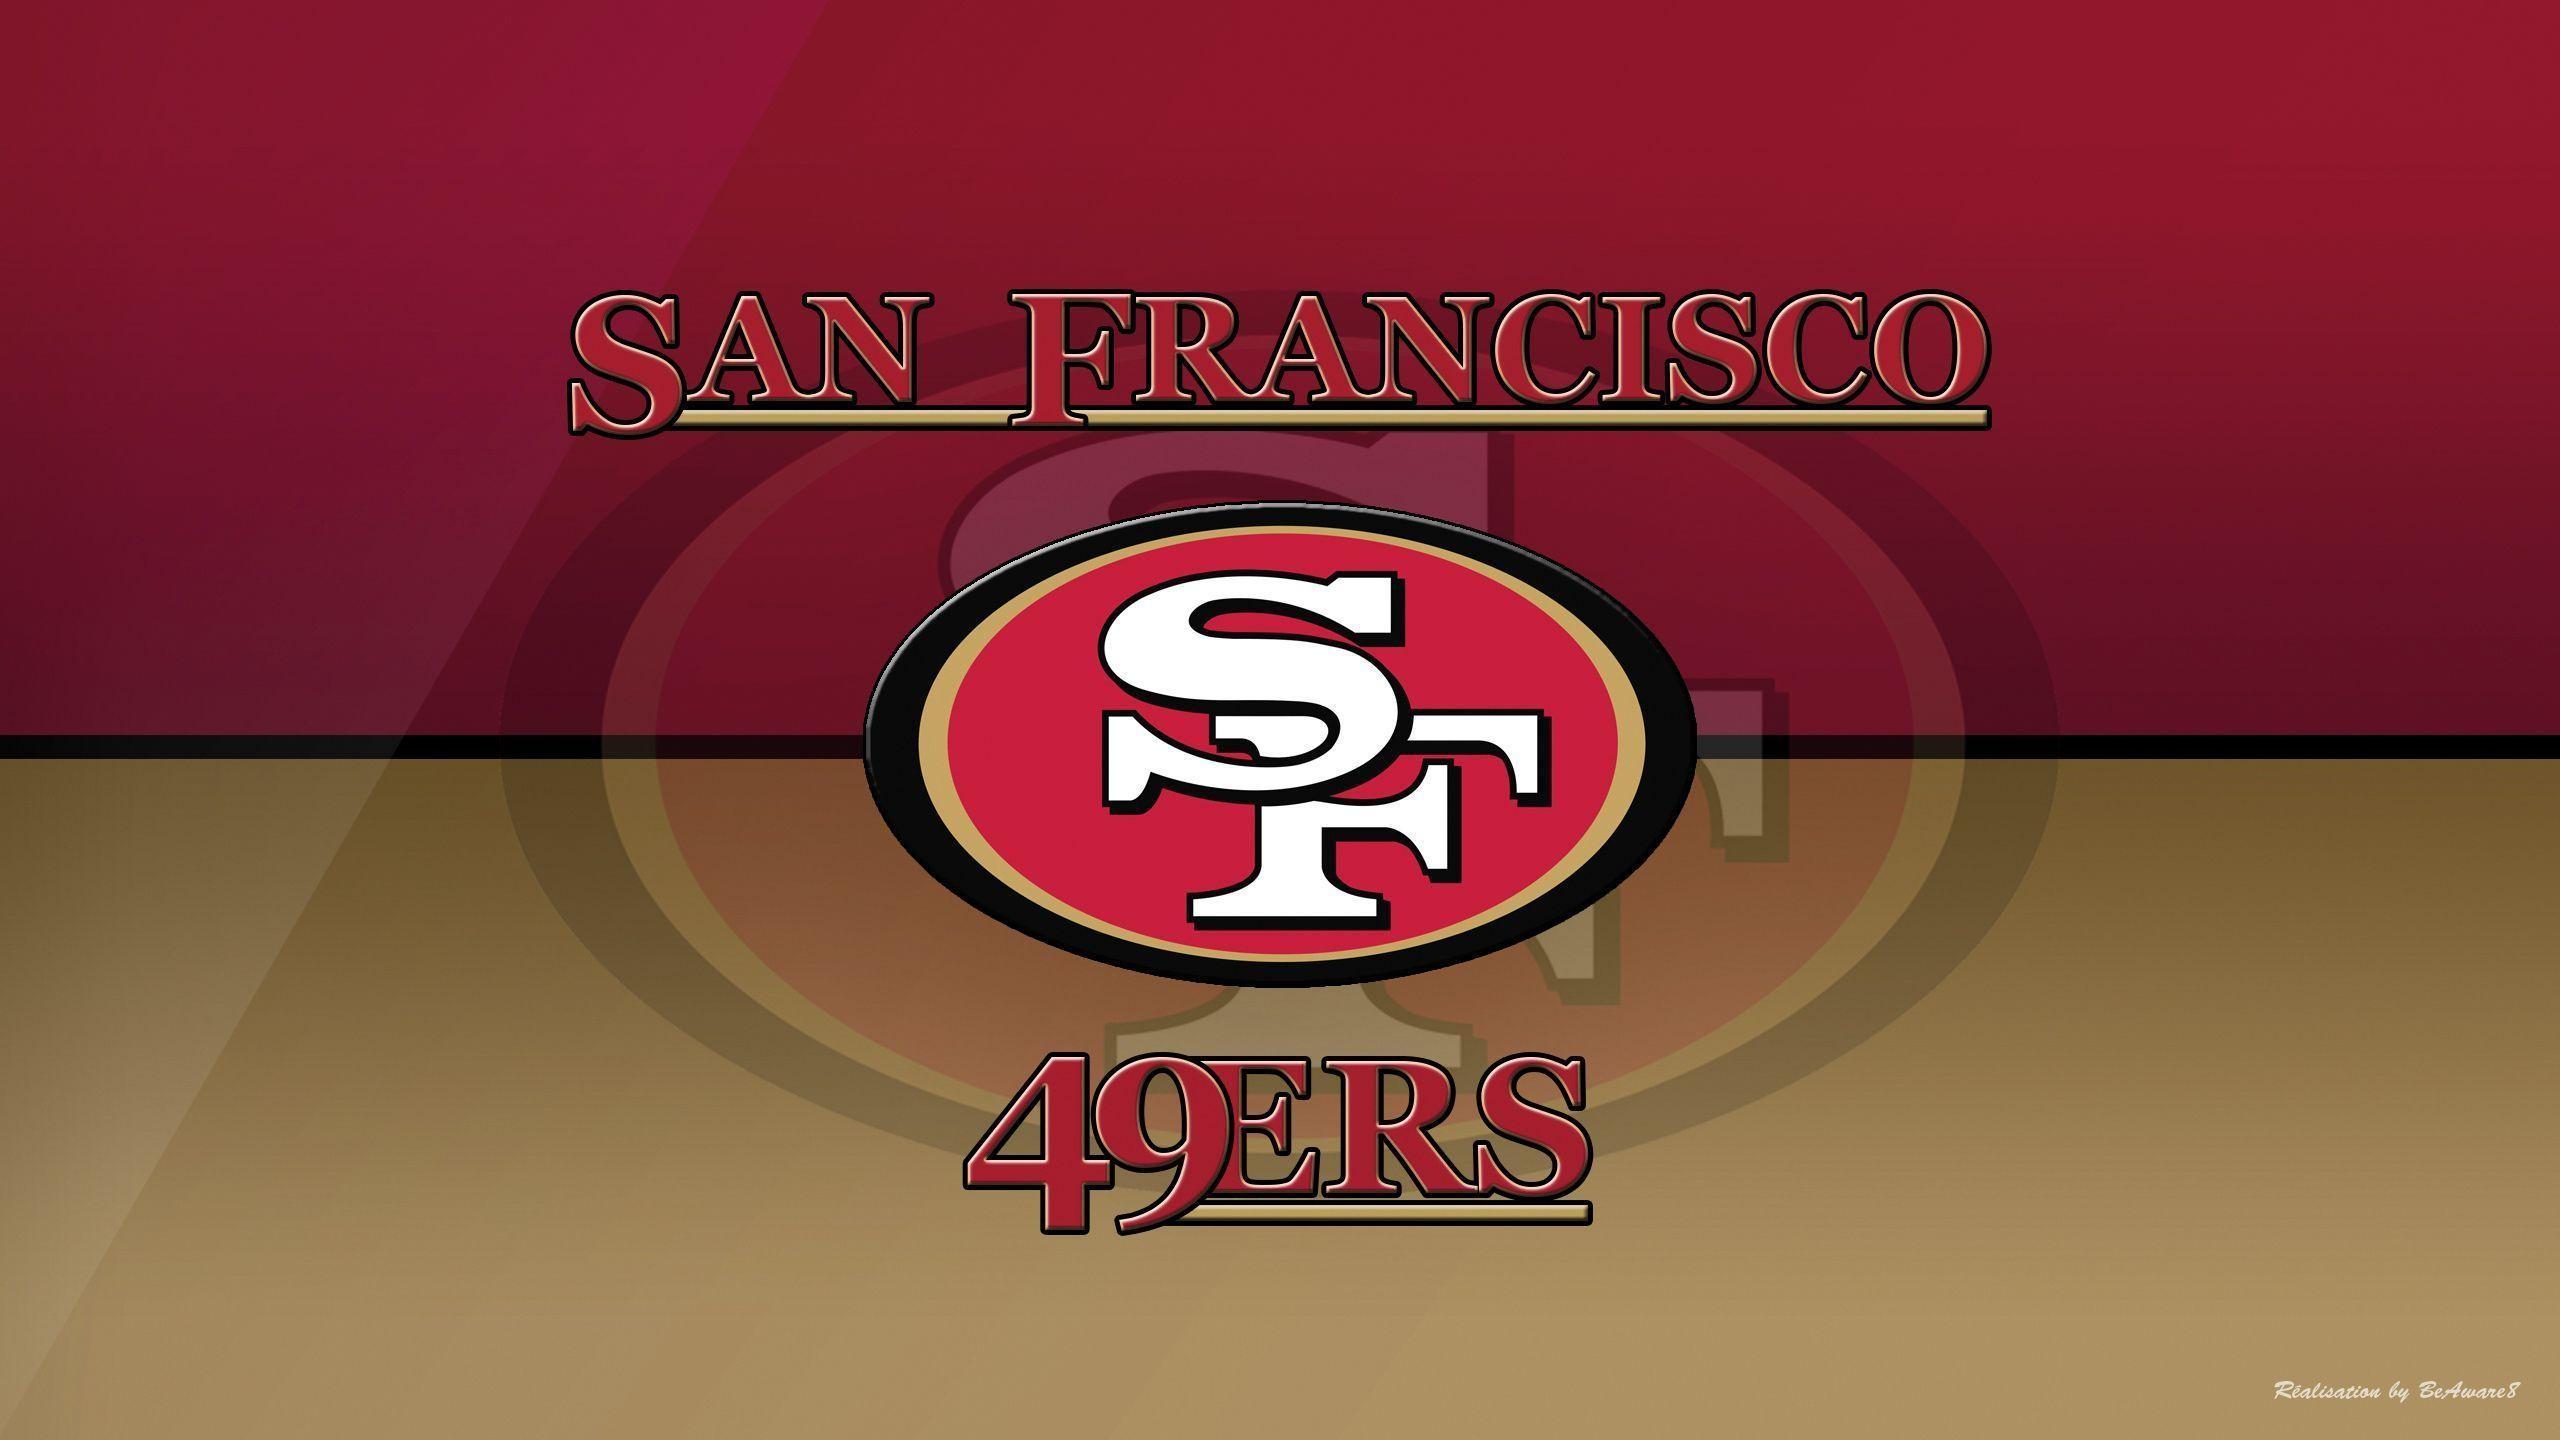 San Francisco 49ers Wallpapers Wallpapertag